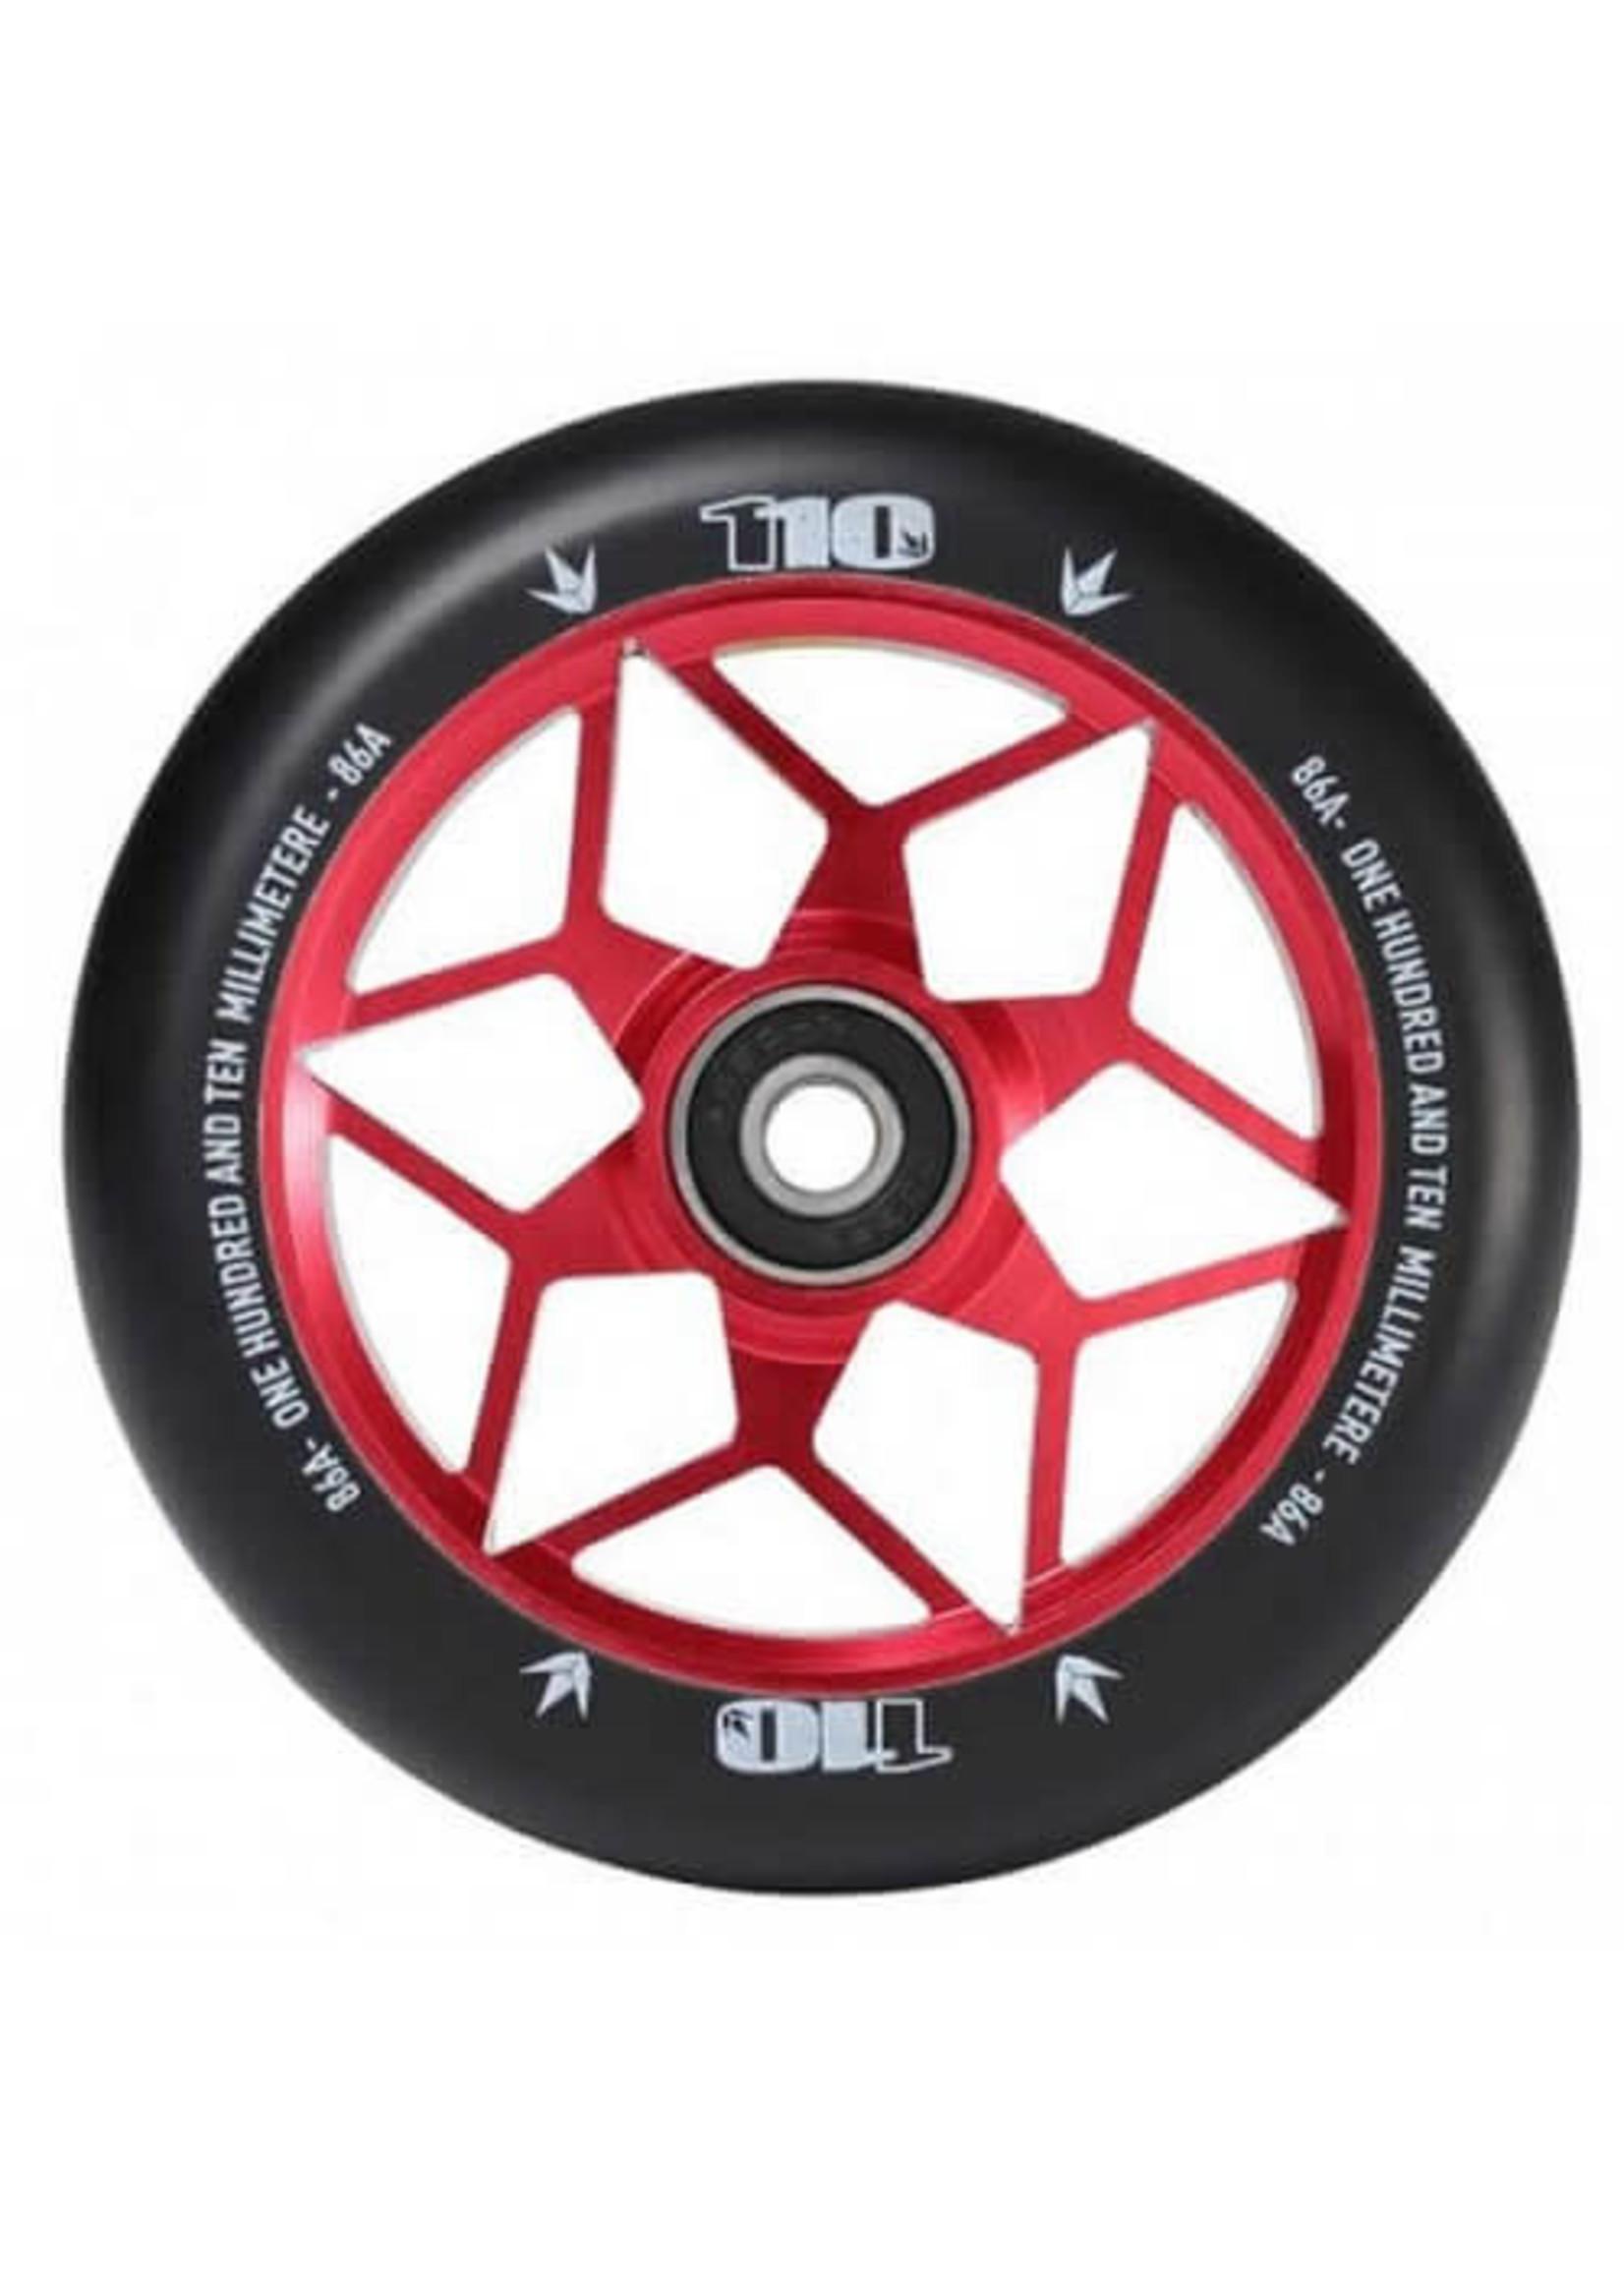 Envy Envy - Diamond Wheels - 110mm